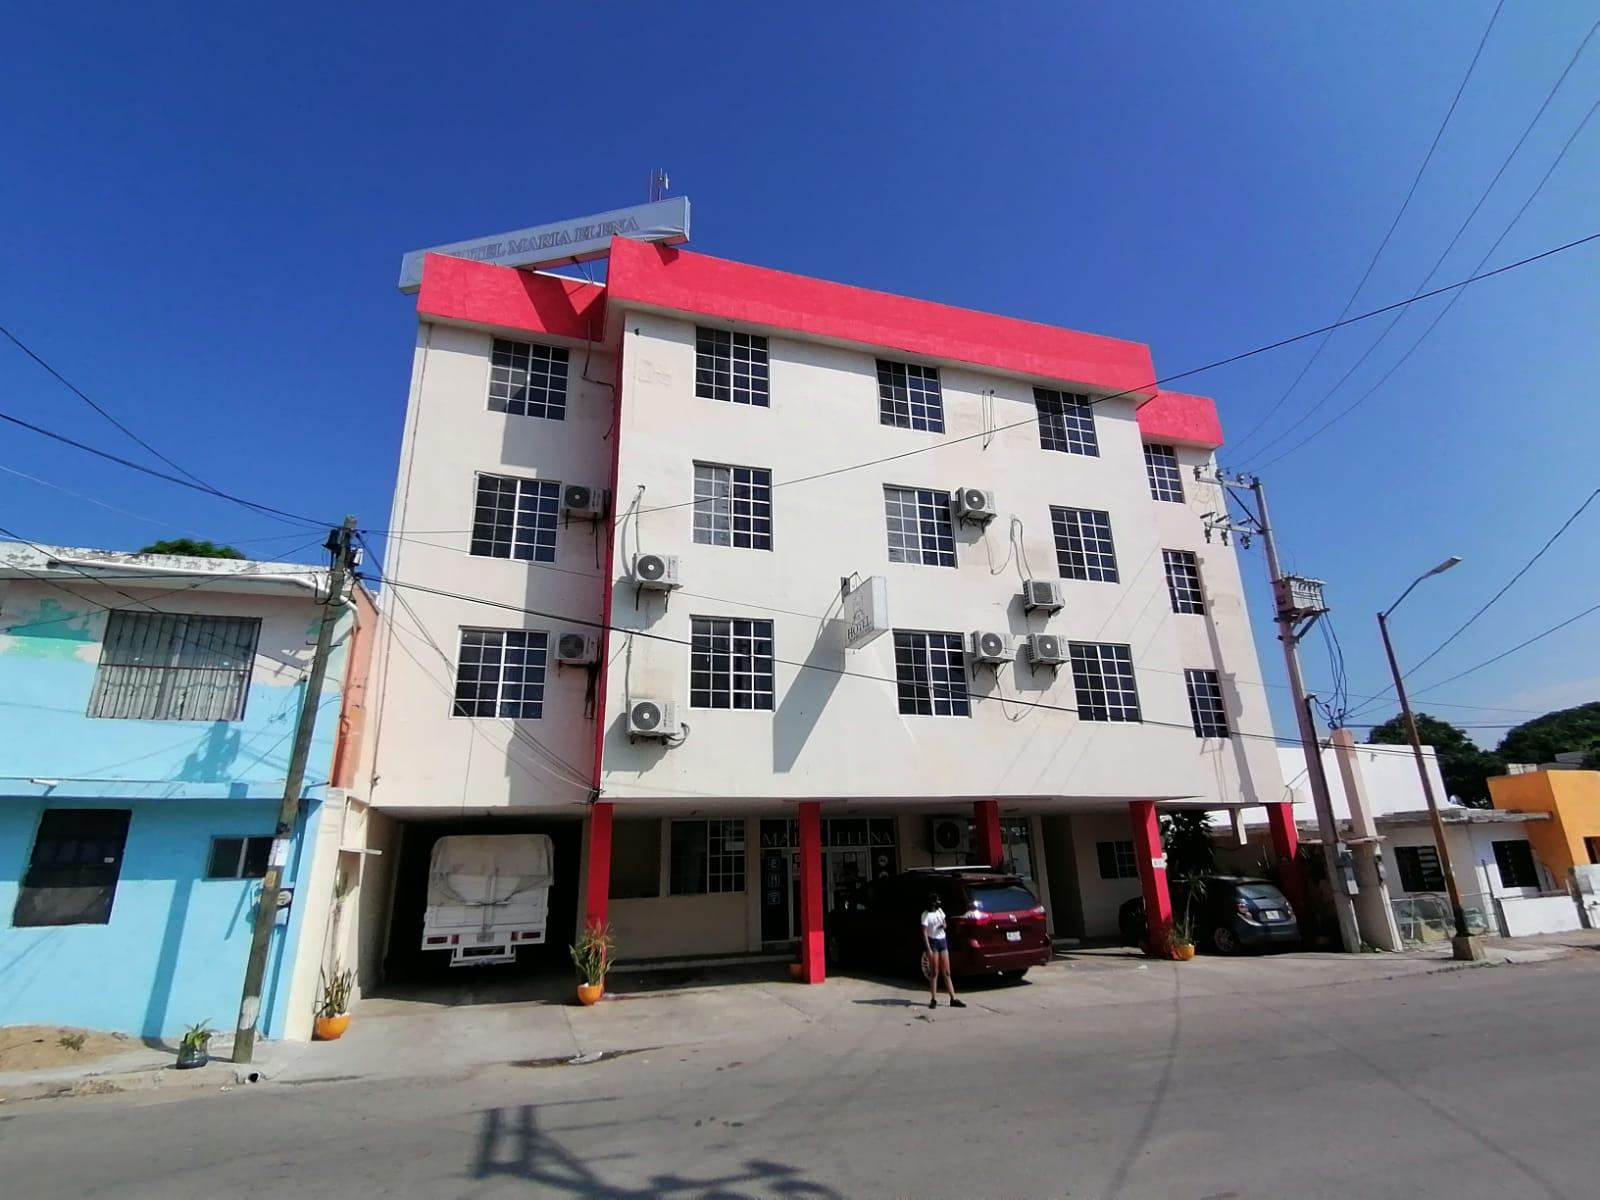 Hotel de Madero ofrece internet a estudiantes